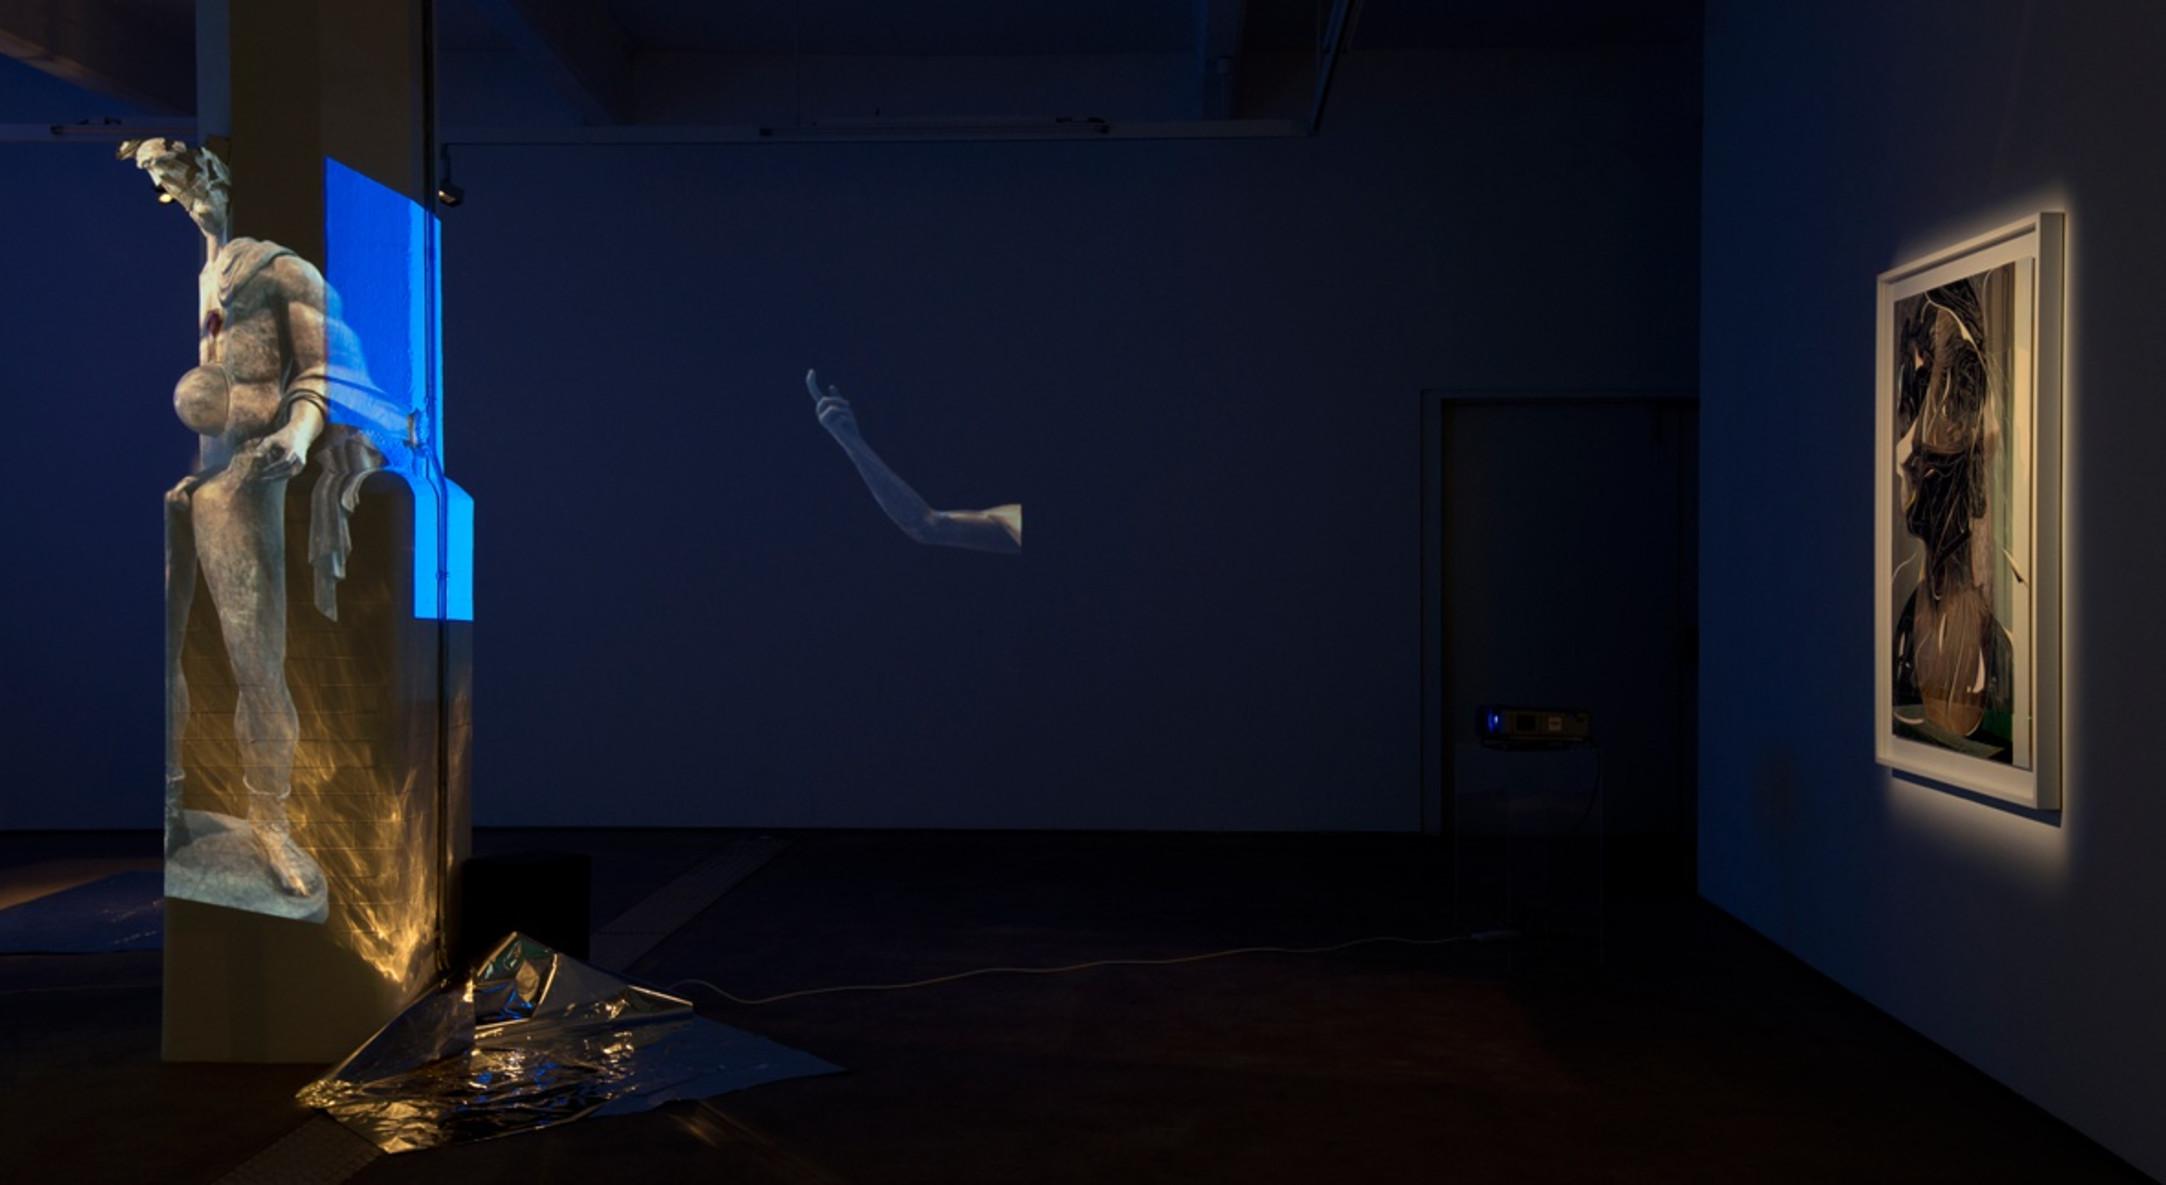 Installation view of Sebastiaan Bremer Σπήλαιο (Spilaio) at Hales Gallery London, 2015